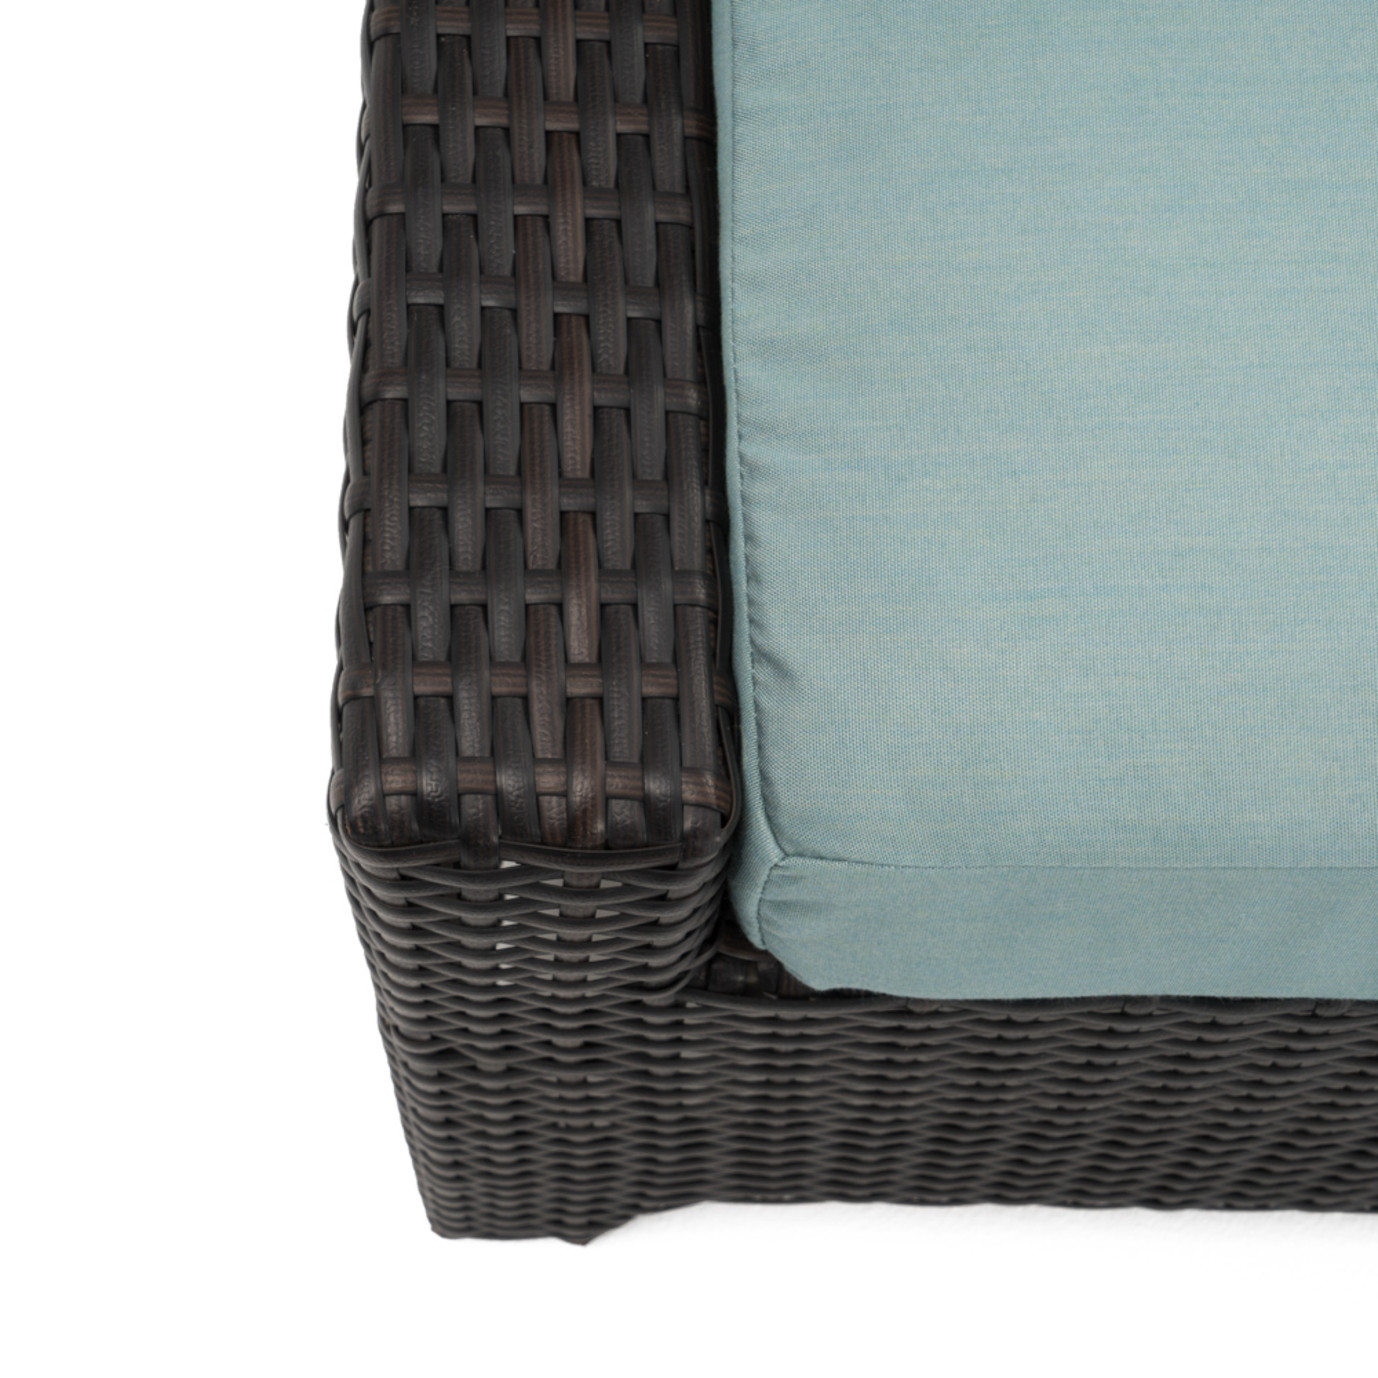 Deco™ Loveseat & Ottoman - Spa Blue